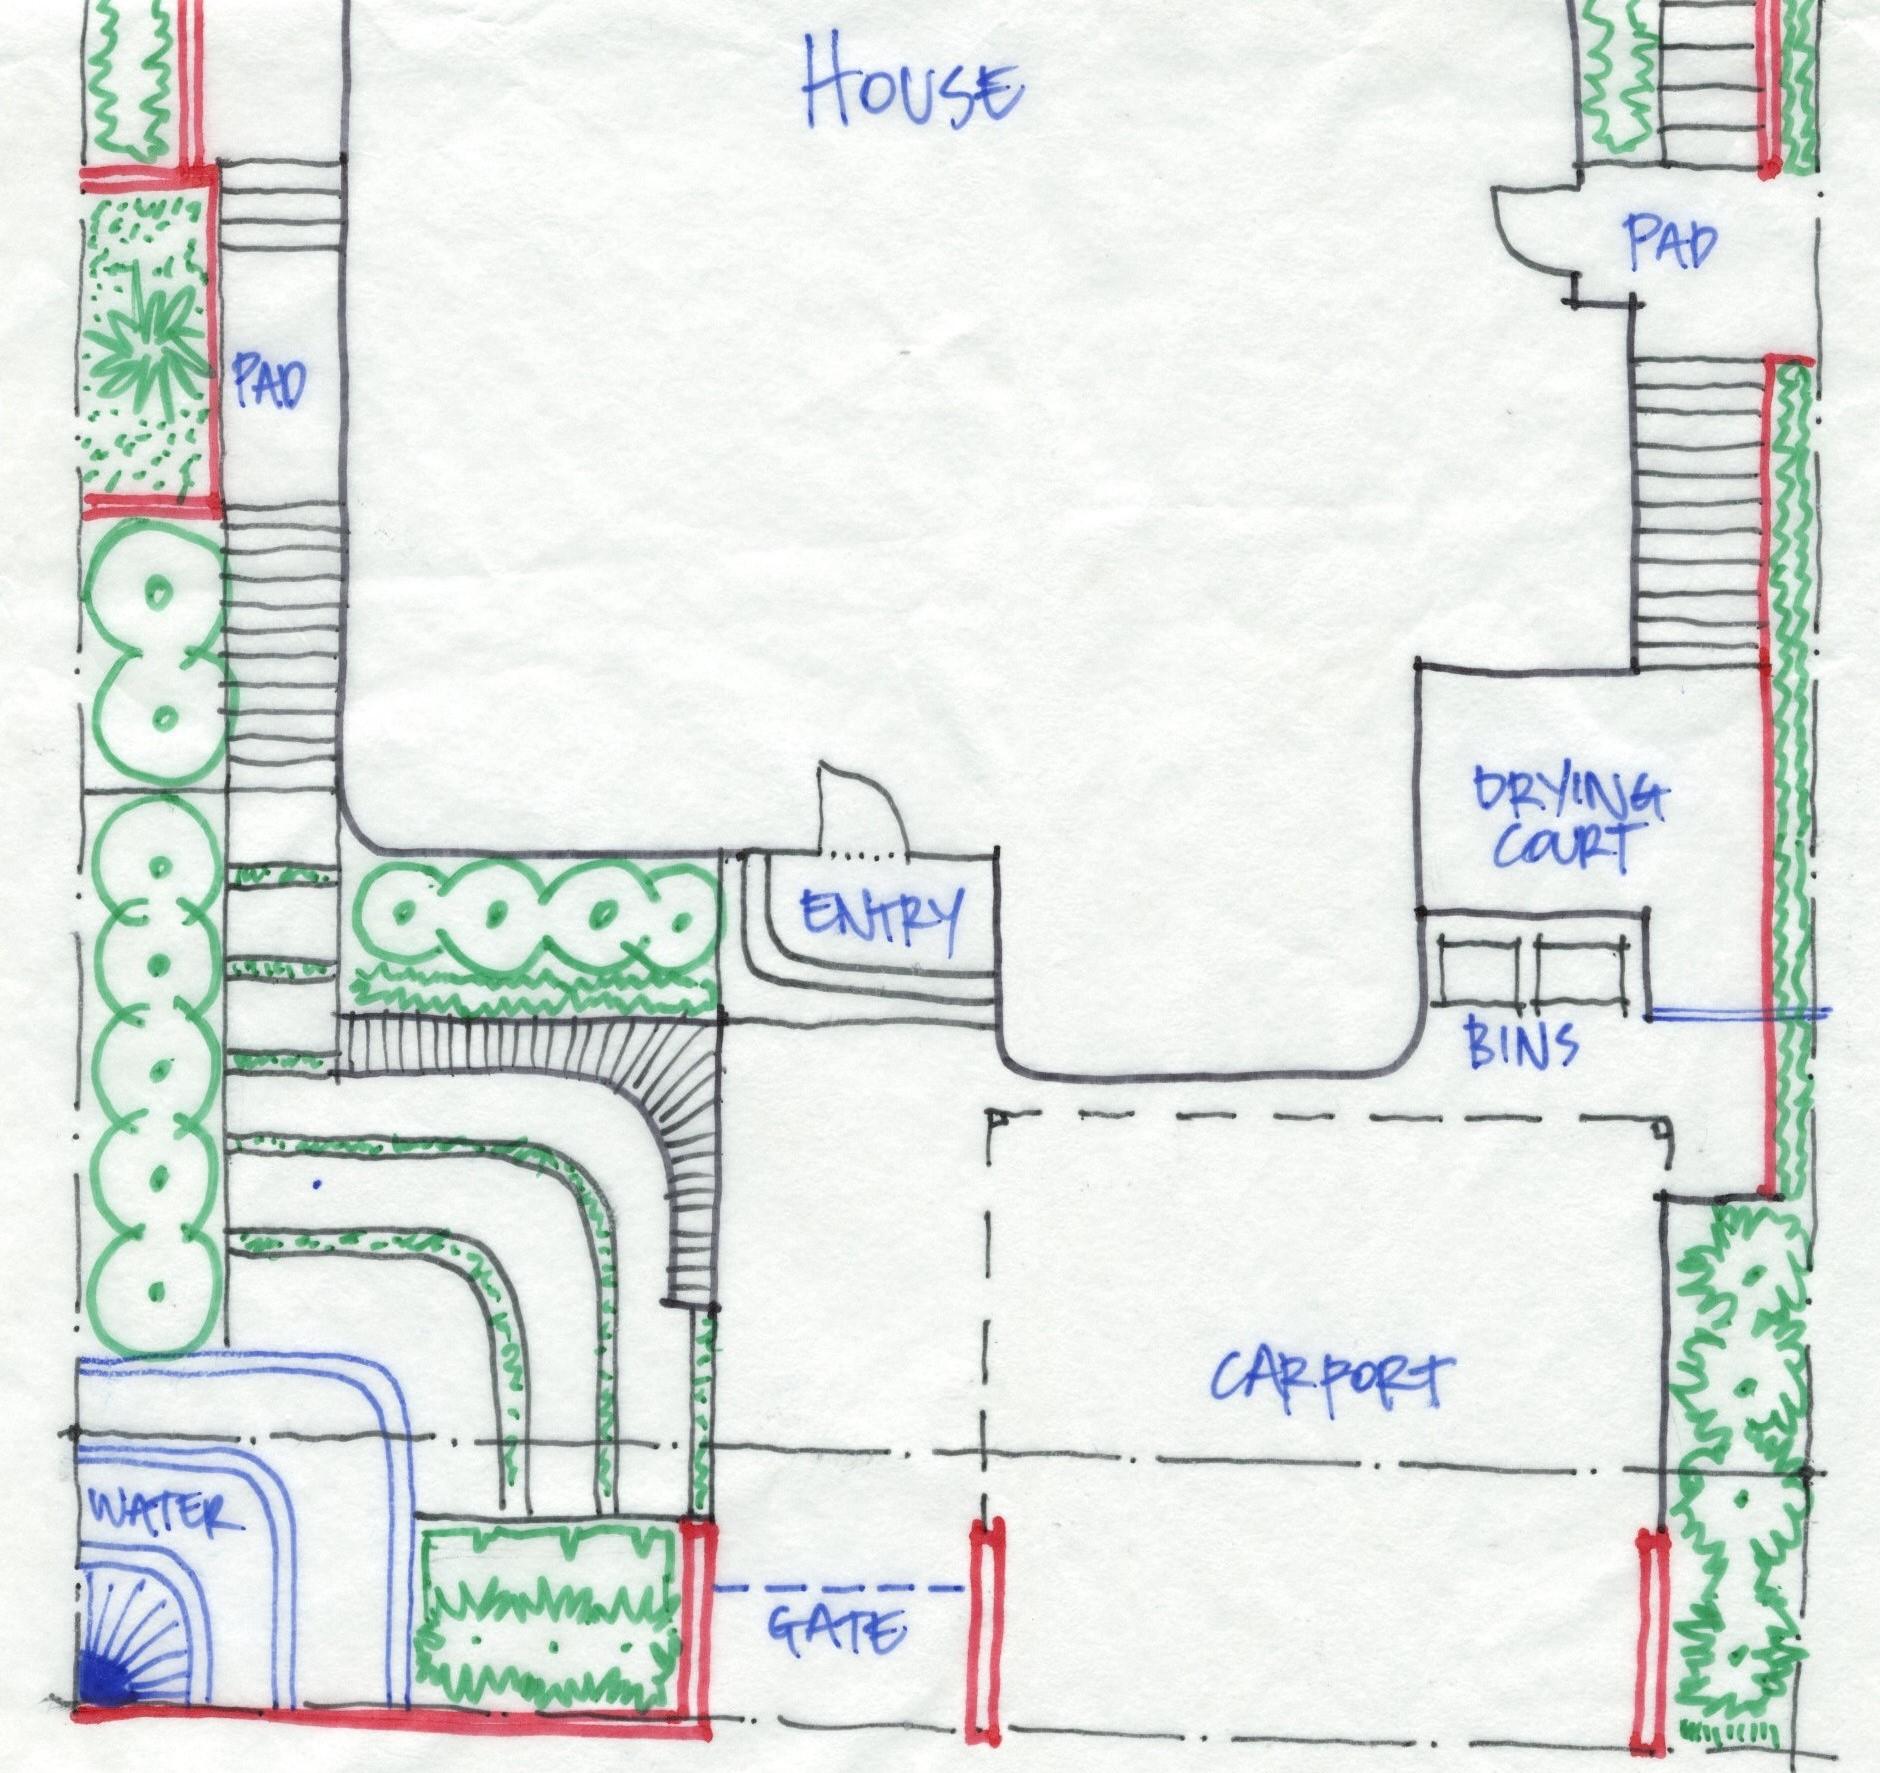 Hand drawn sketch plan